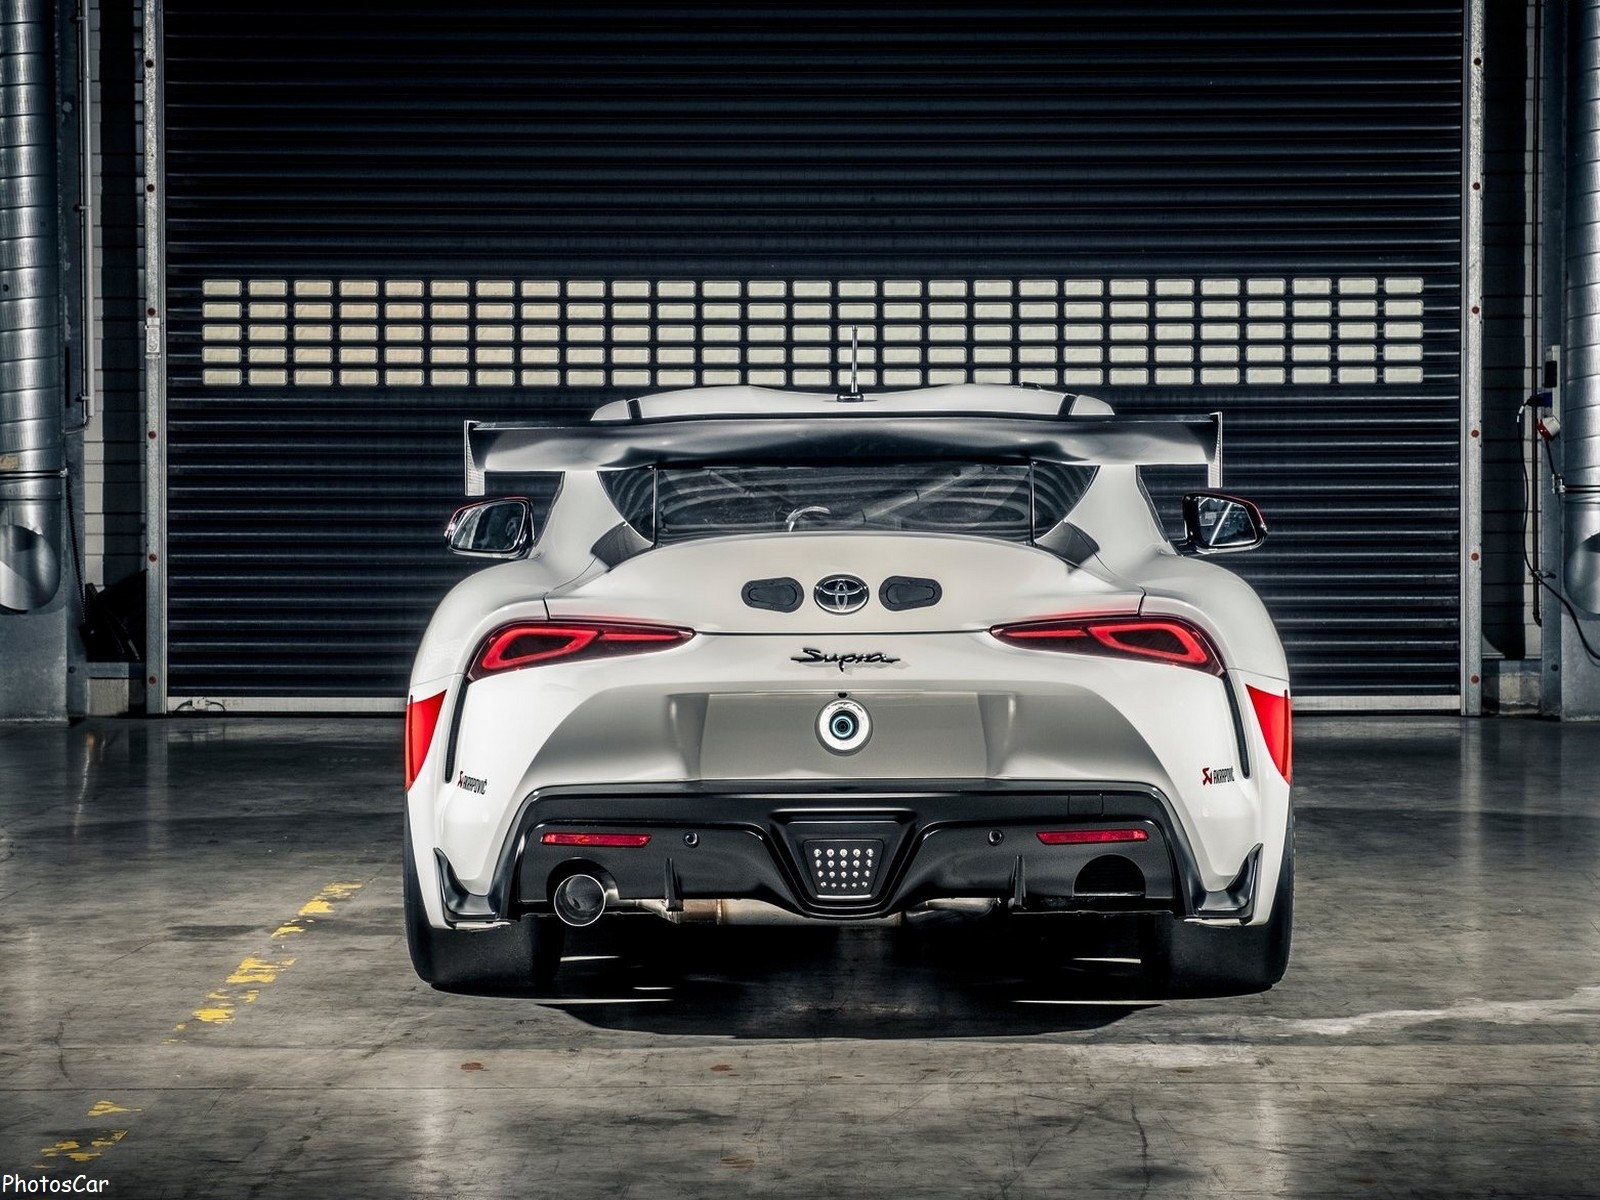 Toyota Supra_GT4 2020